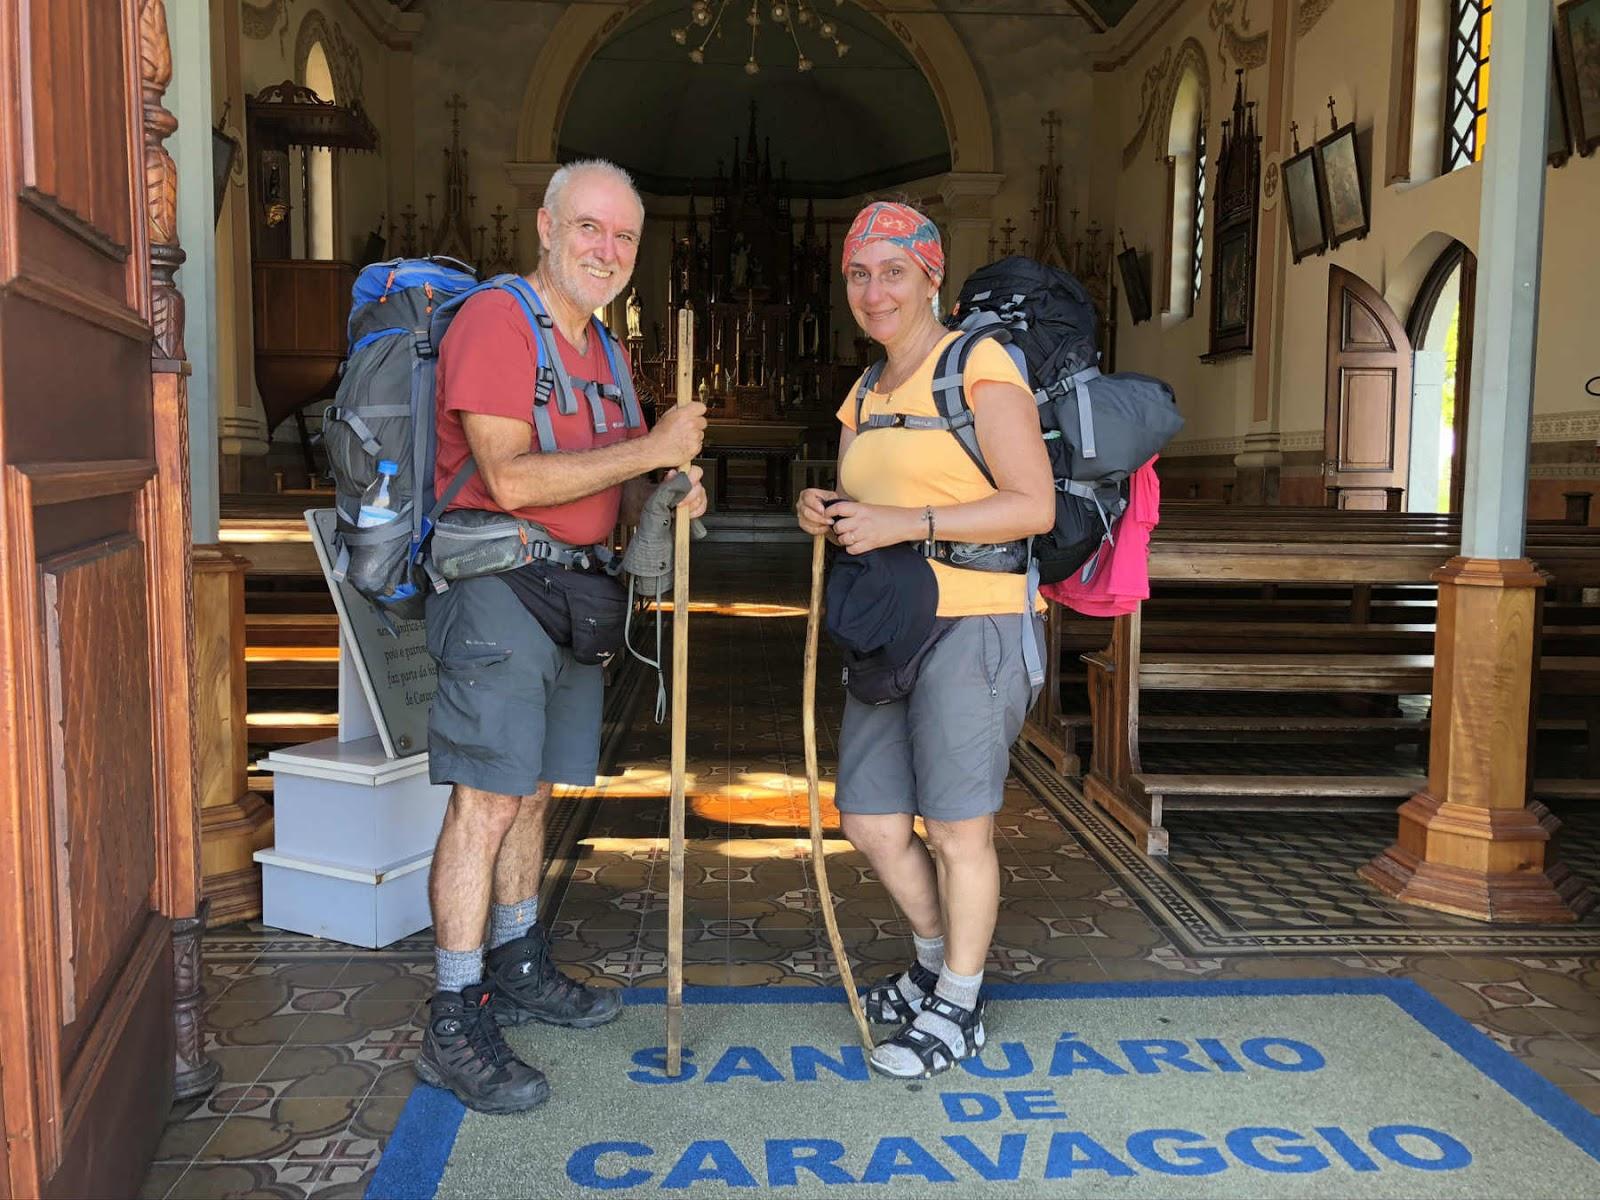 Santuário de Caravaggio - Farroupilha